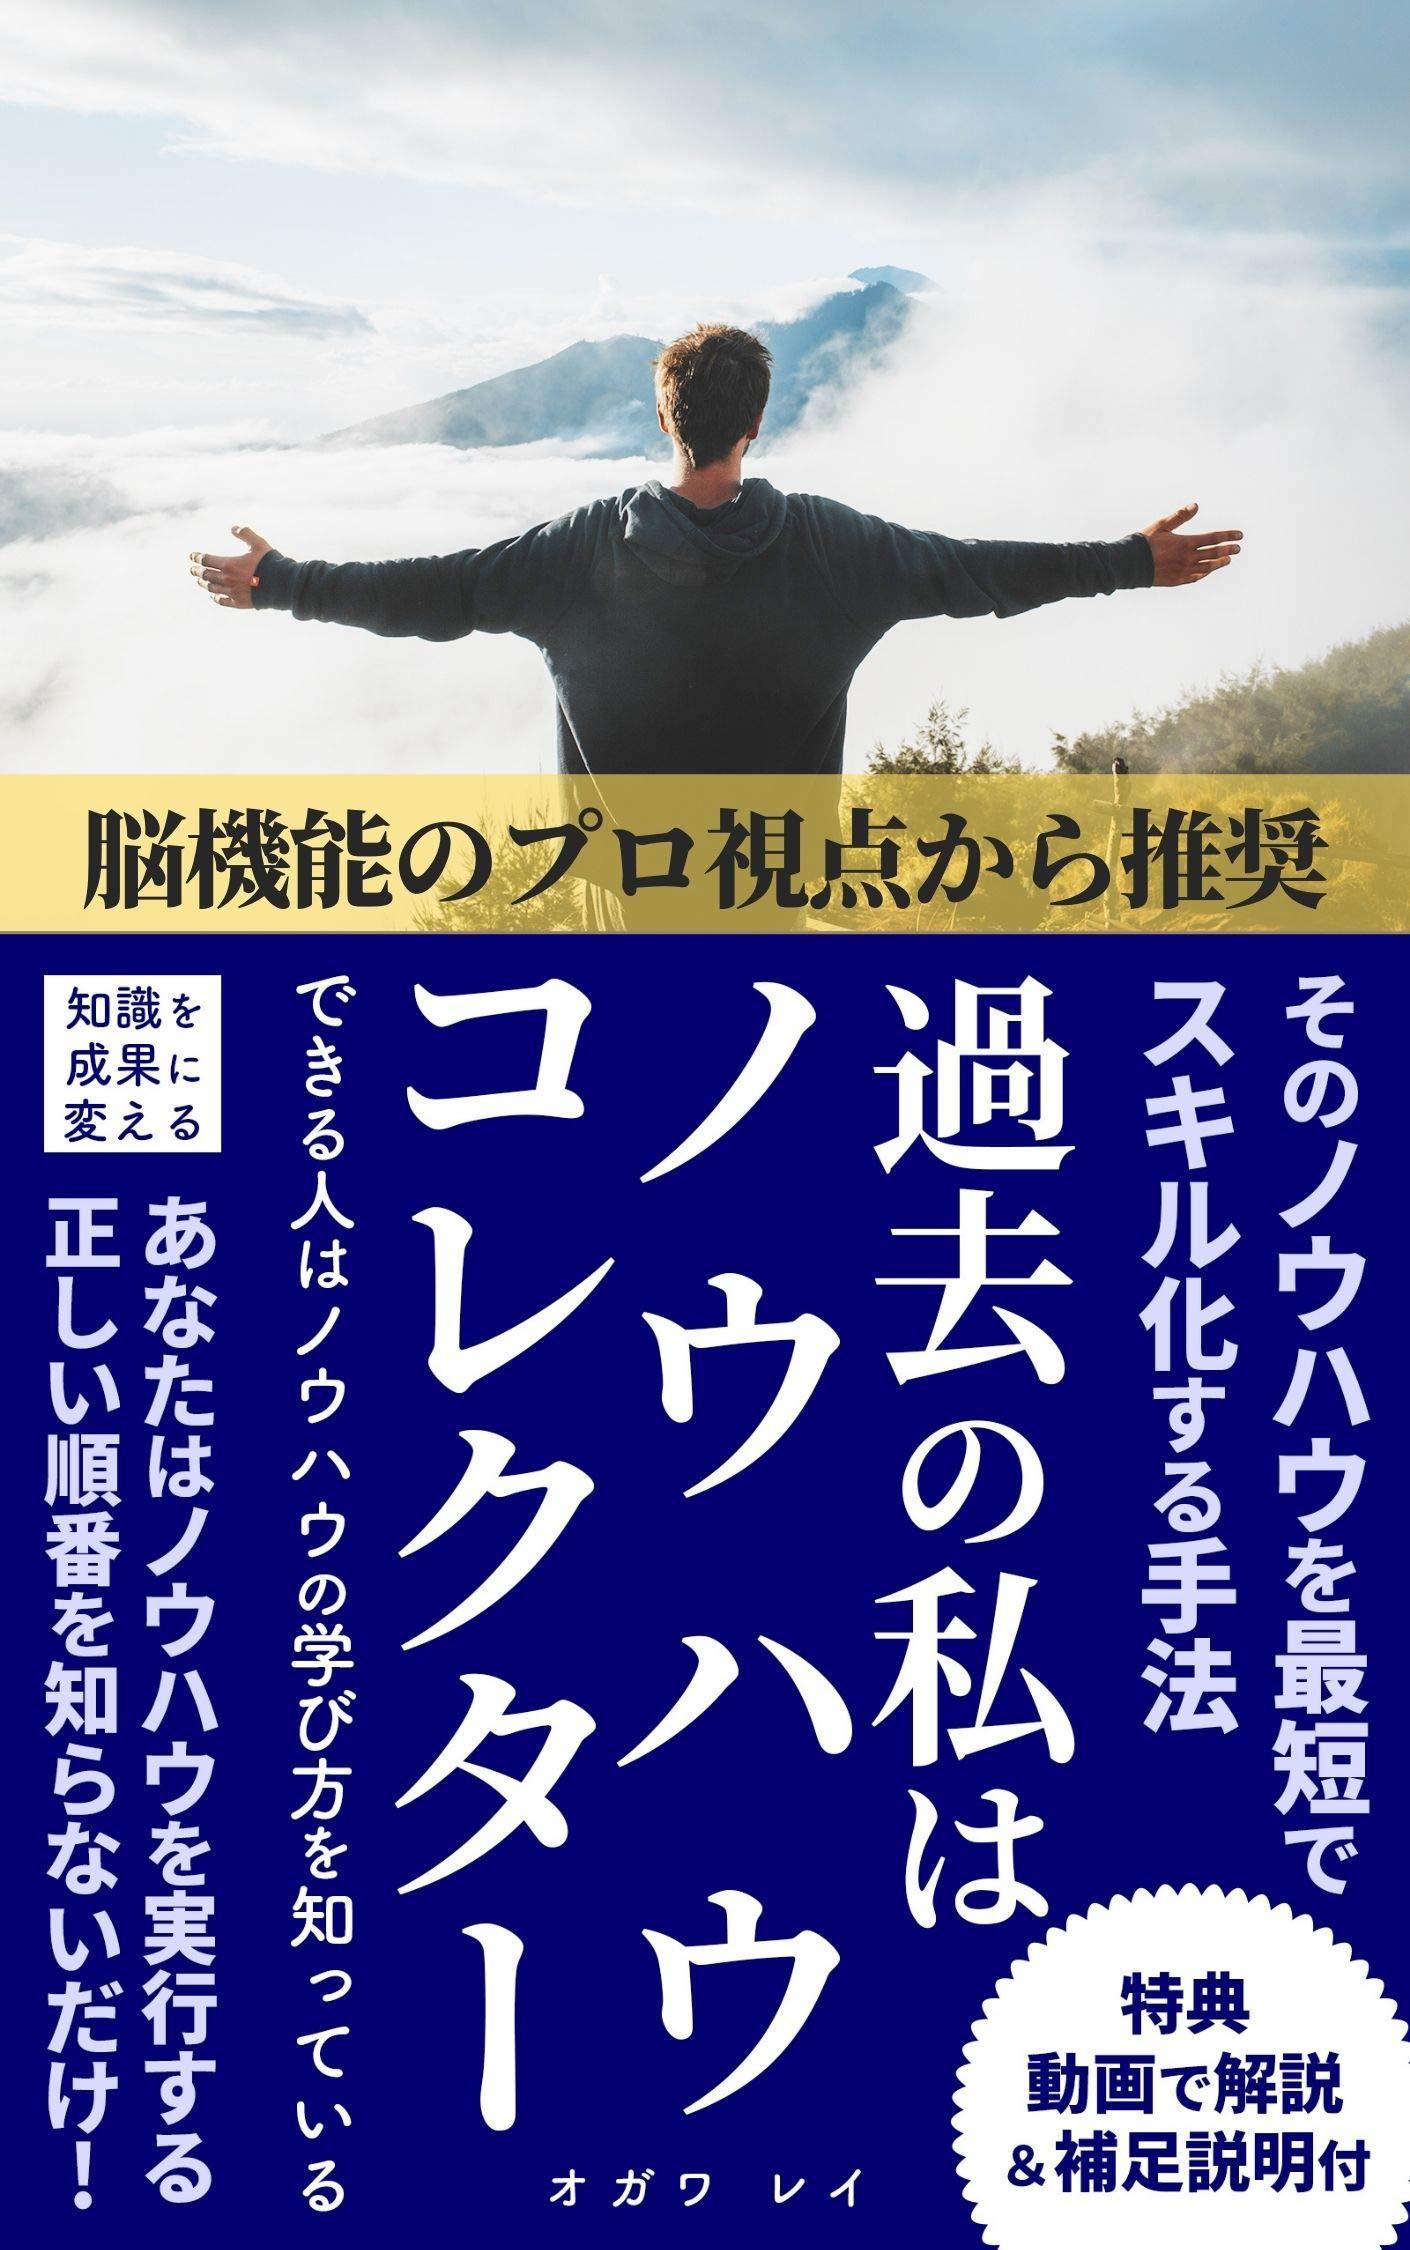 KAKONOWATASIHANOUHAUKOREKUTA: NOUHAUWOSAITANNDESUKIRUKASURUSYUHOU (Japanese Edition)